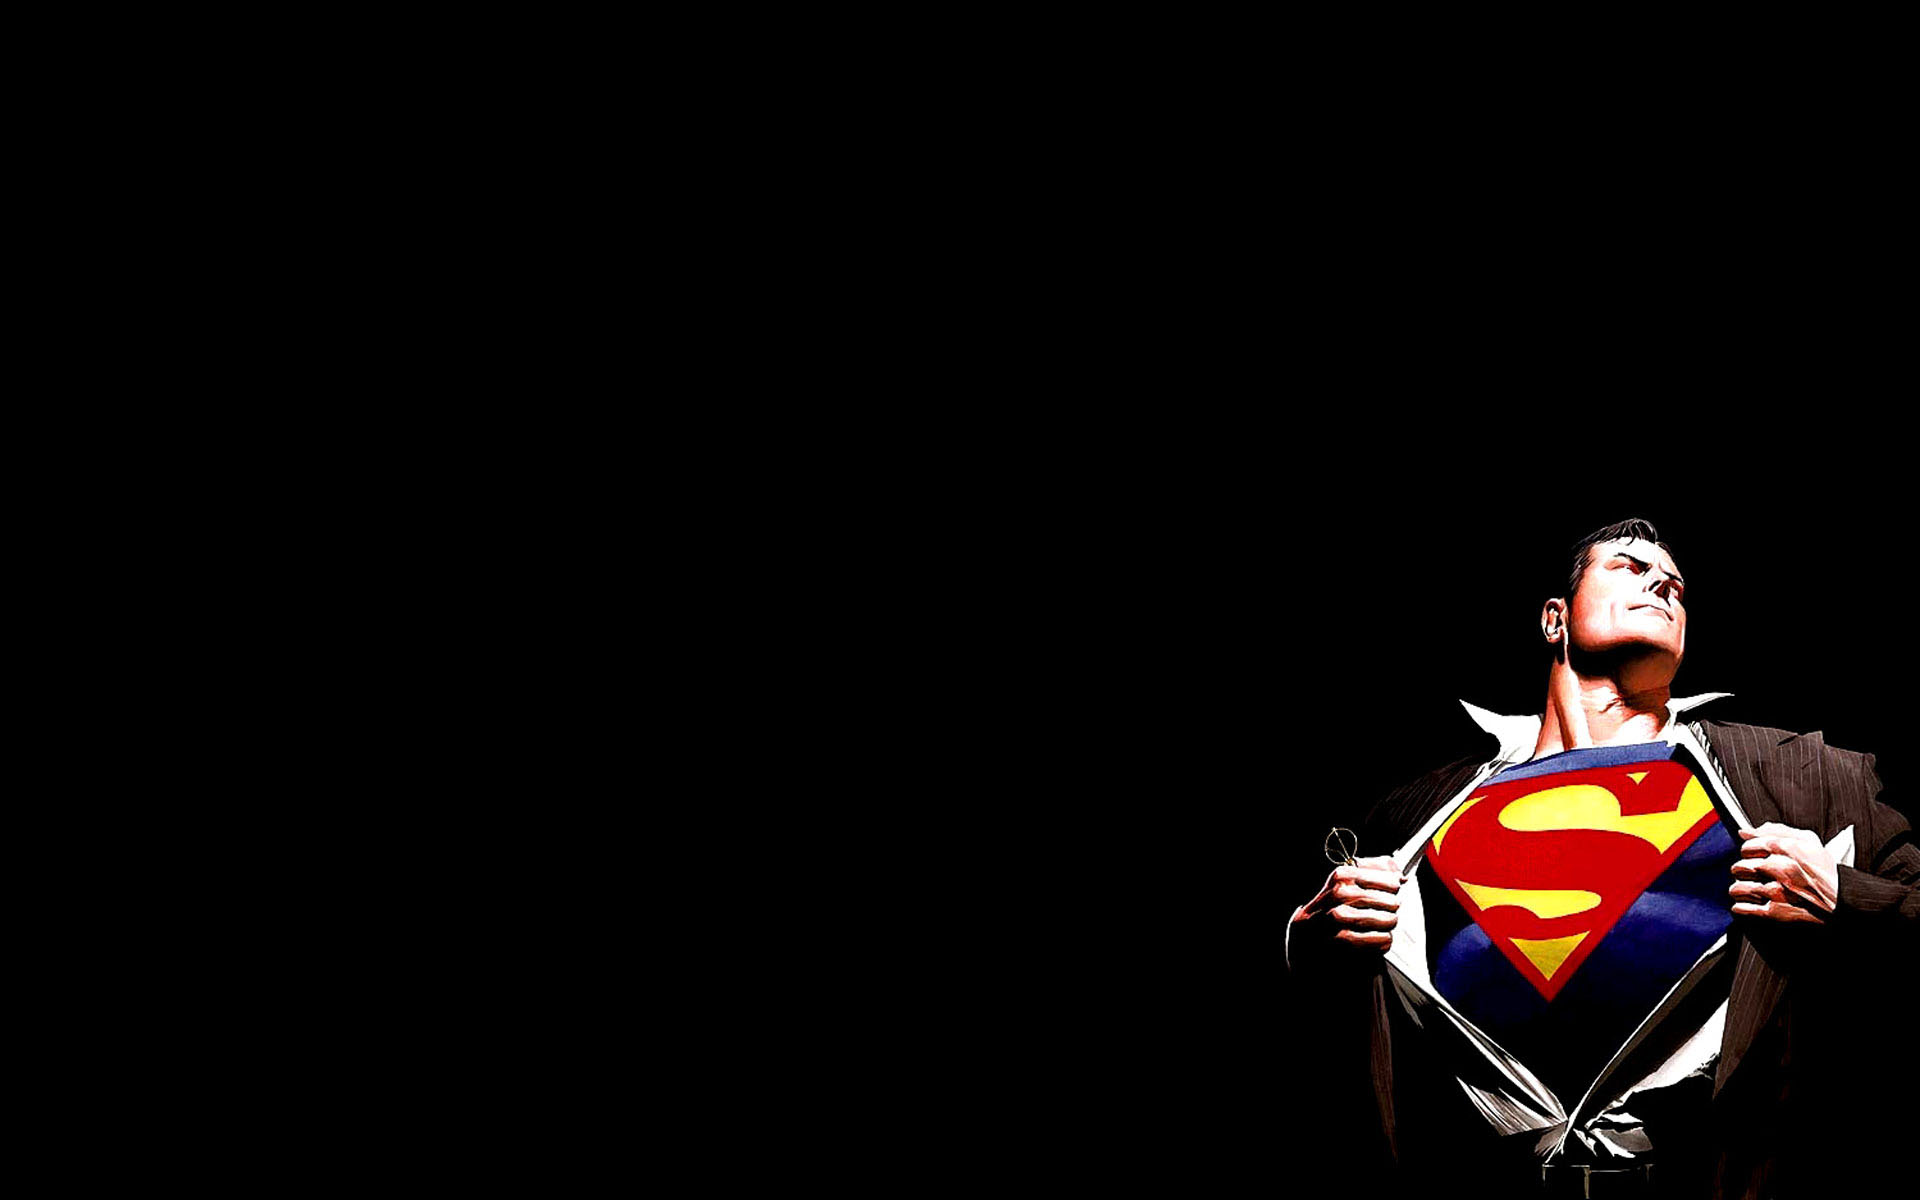 Superman Wallpaper HD Wallpupcom 1920x1200